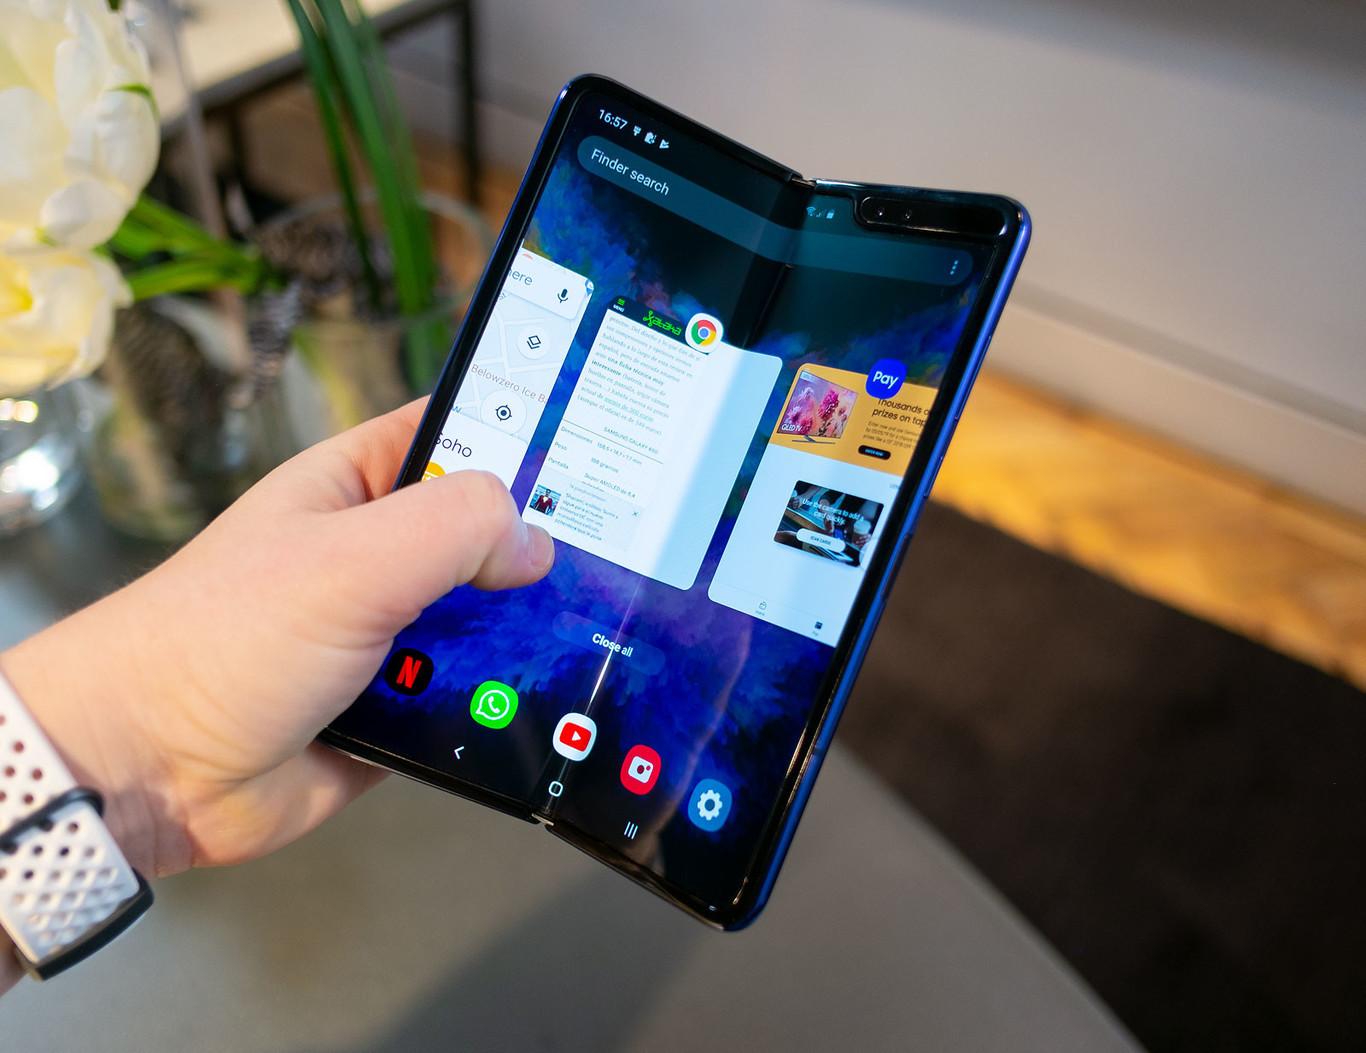 Samsung parece estar explorando un teléfono con pantalla emergente